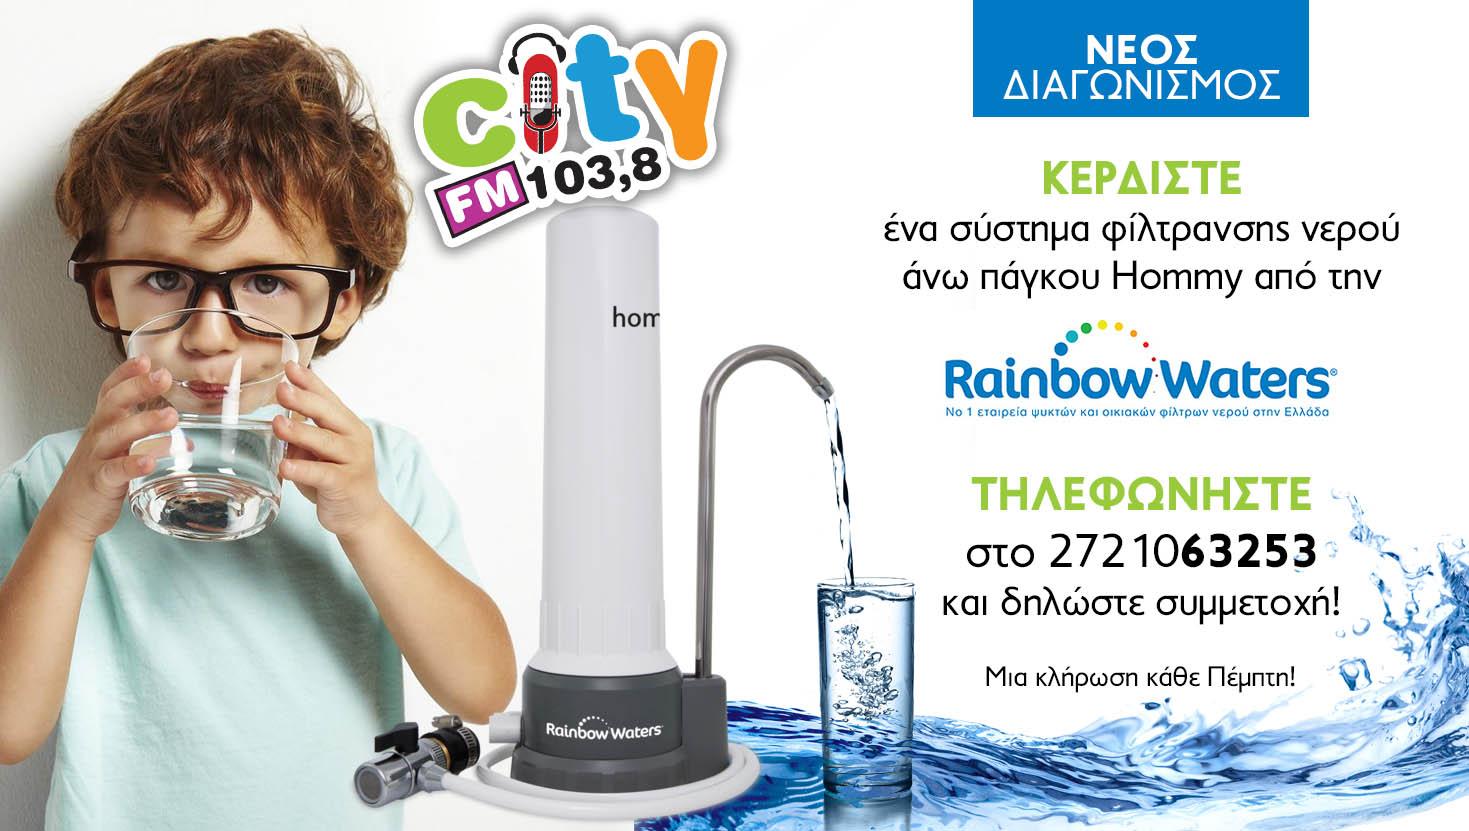 b7d5488d1d Κερδίστε Φίλτρα Νερού από τη RAINBOW WATERS! - Messinia Radio